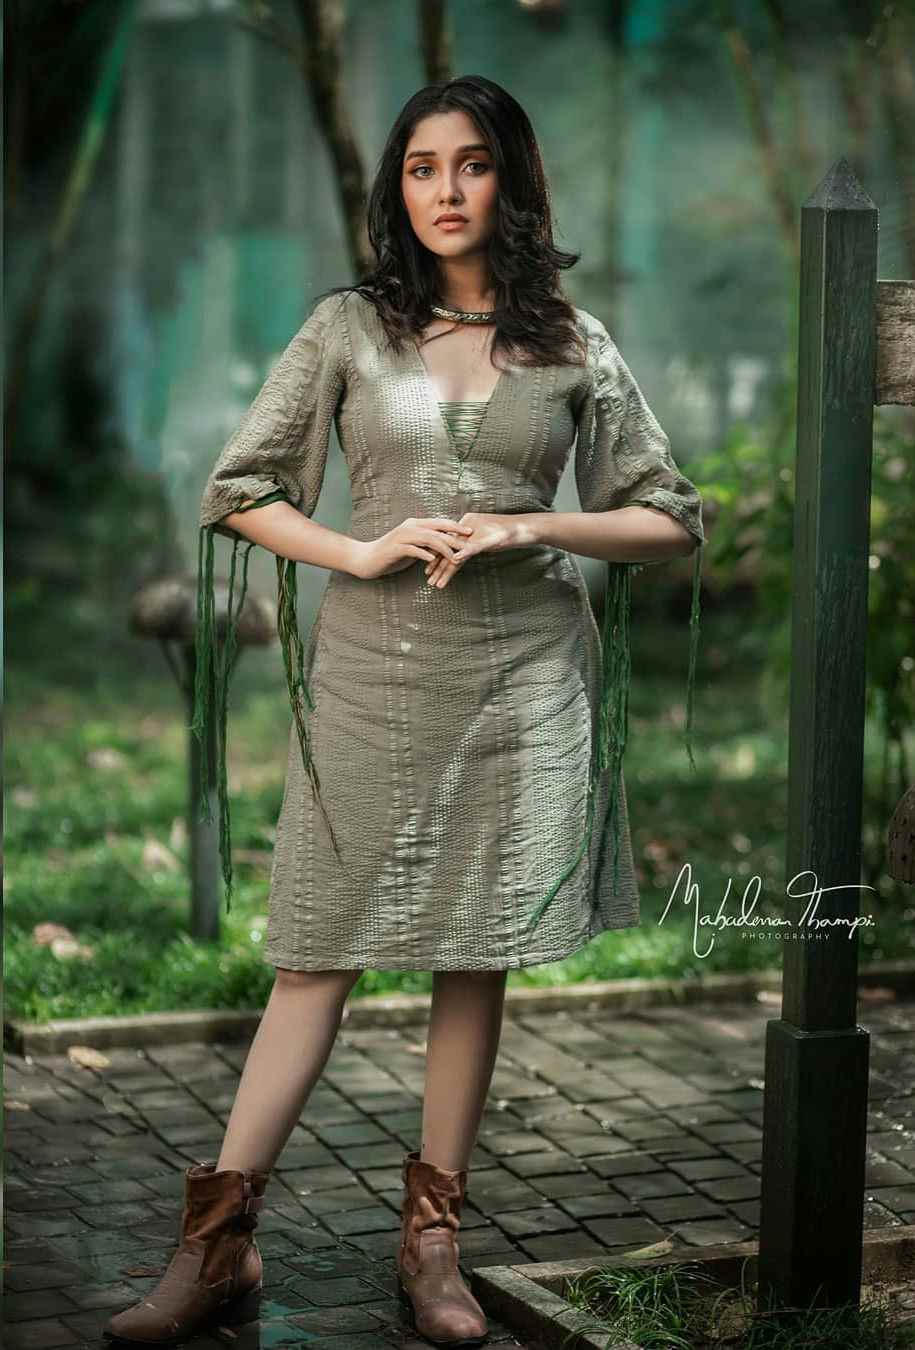 Mallu actress Anikha Surendran Photo Gallery